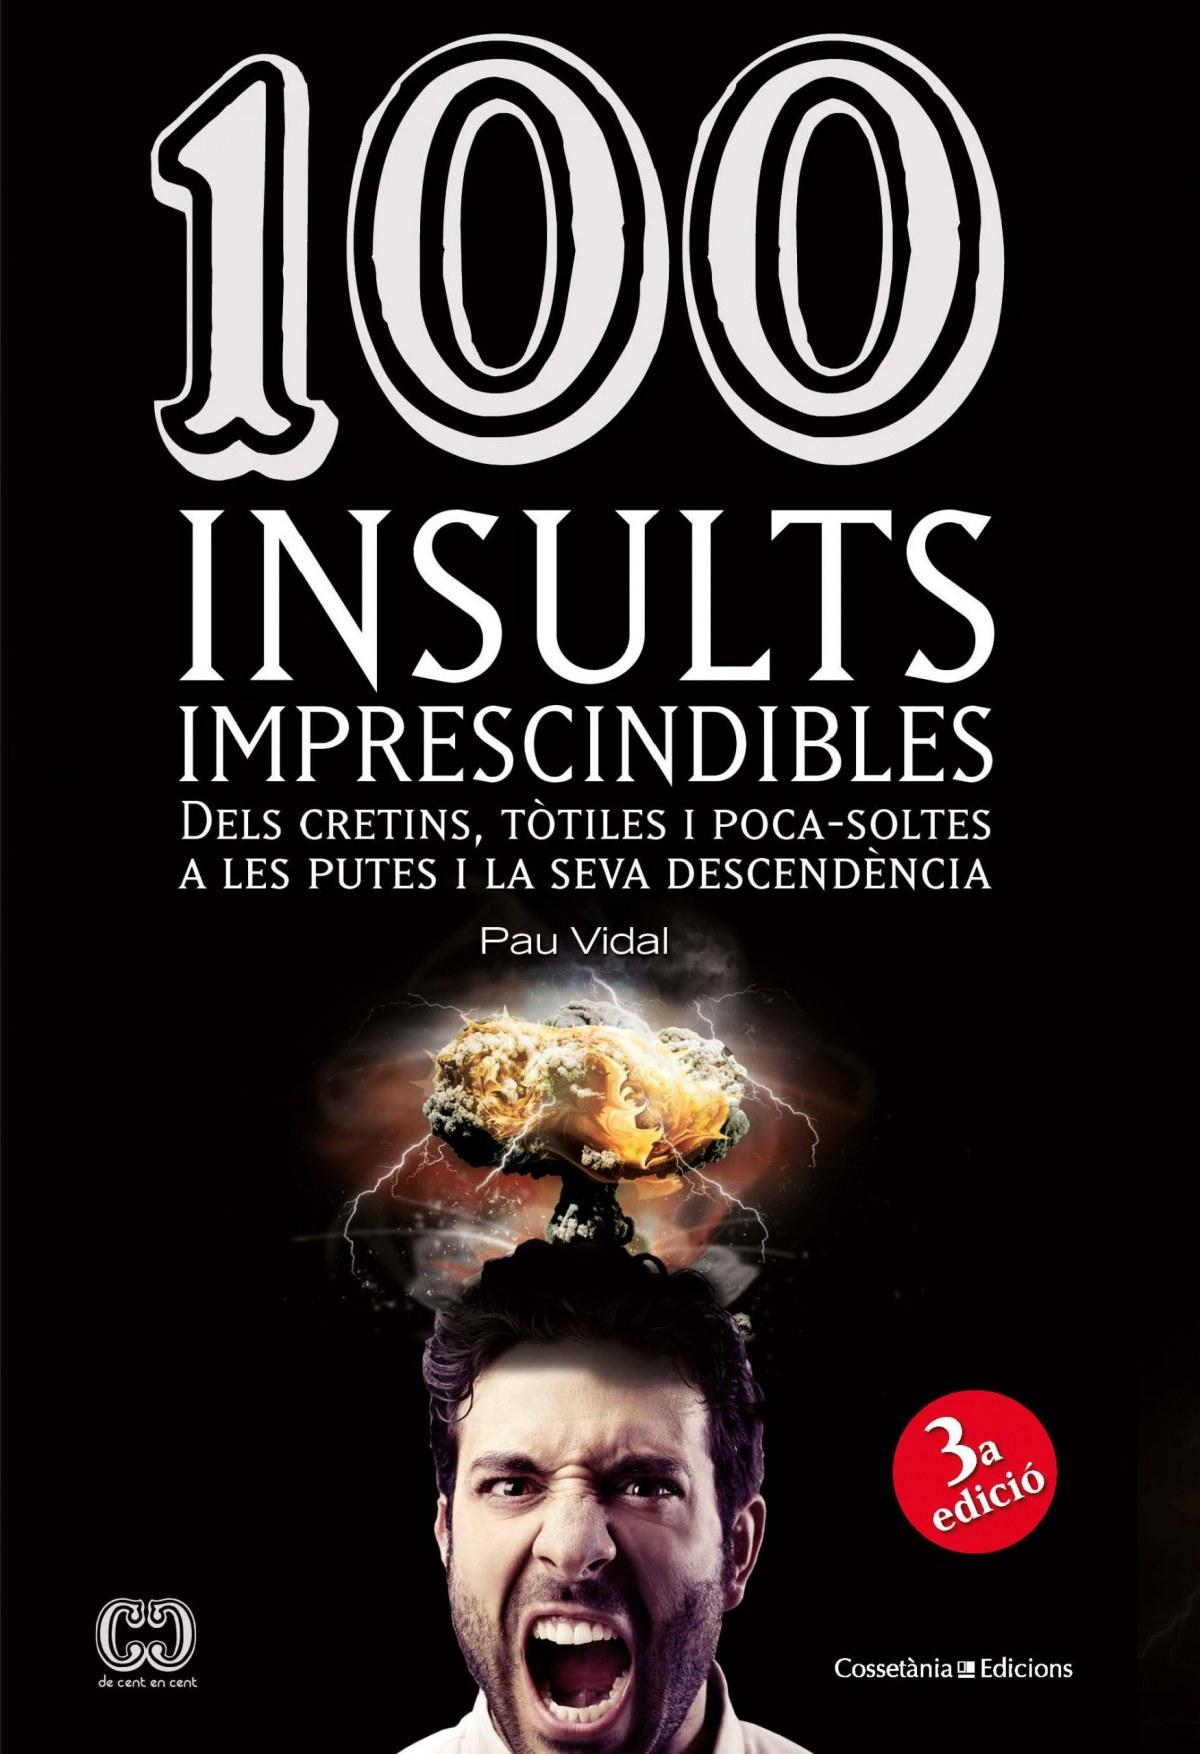 100 insults imprescindibles 9788490341896